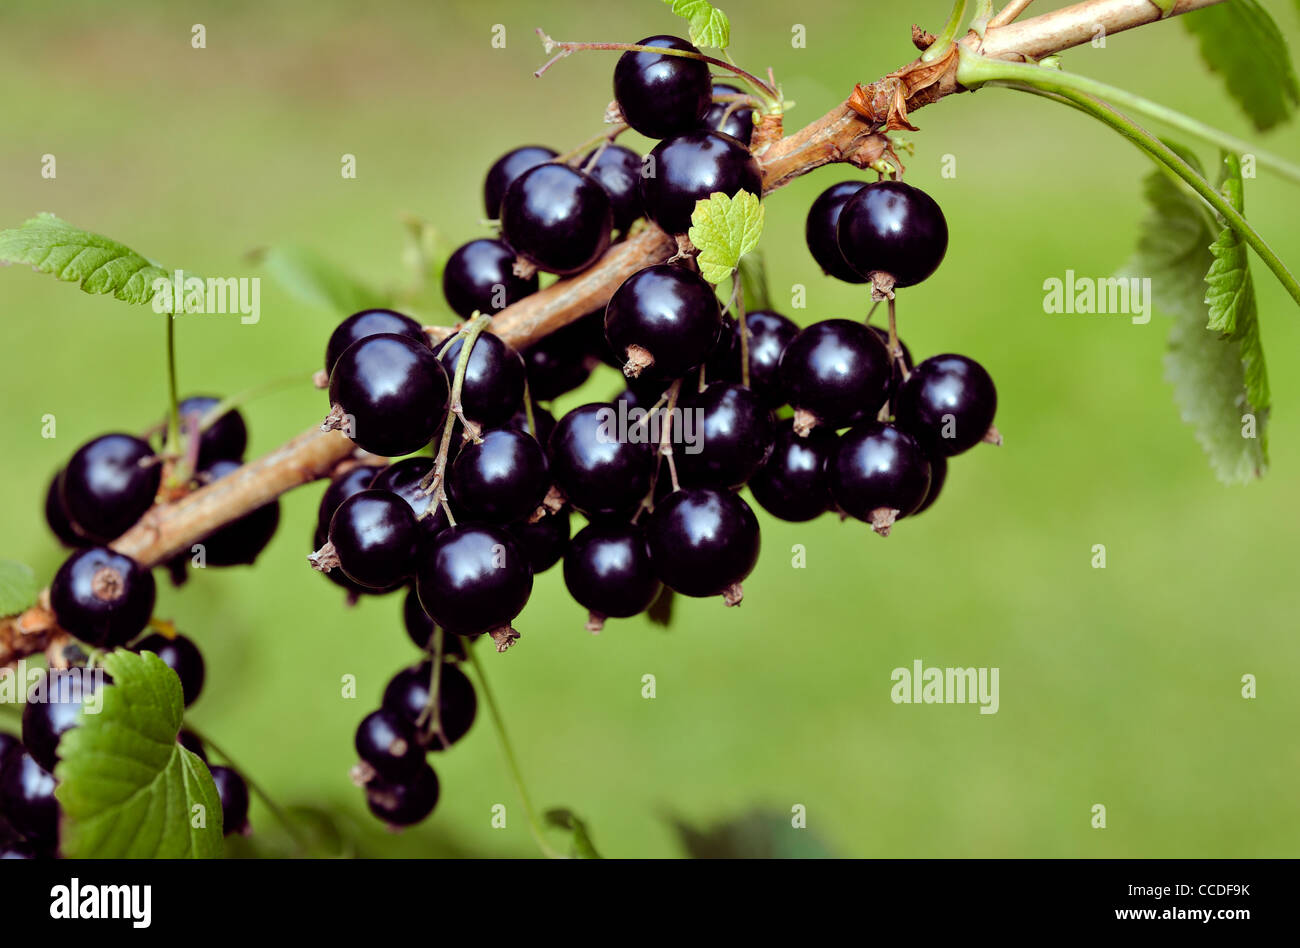 BLACKCURRANTS GROWING ON BUSH - Stock Image